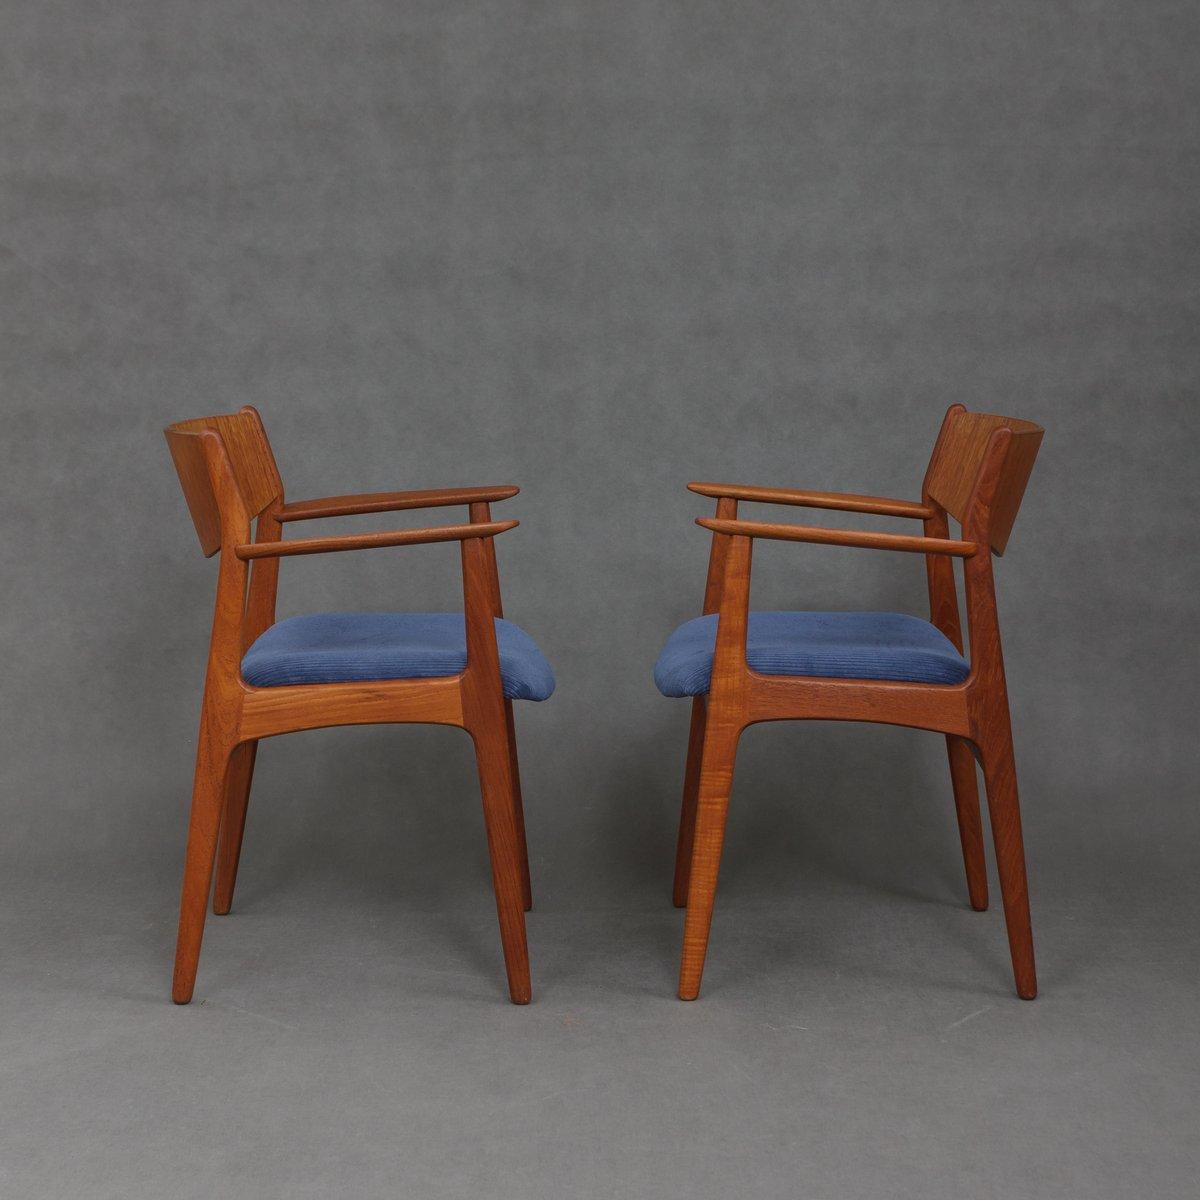 d nische vintage teak armlehnst hle mit kord sitzen 1960er 2er set bei pamono kaufen. Black Bedroom Furniture Sets. Home Design Ideas